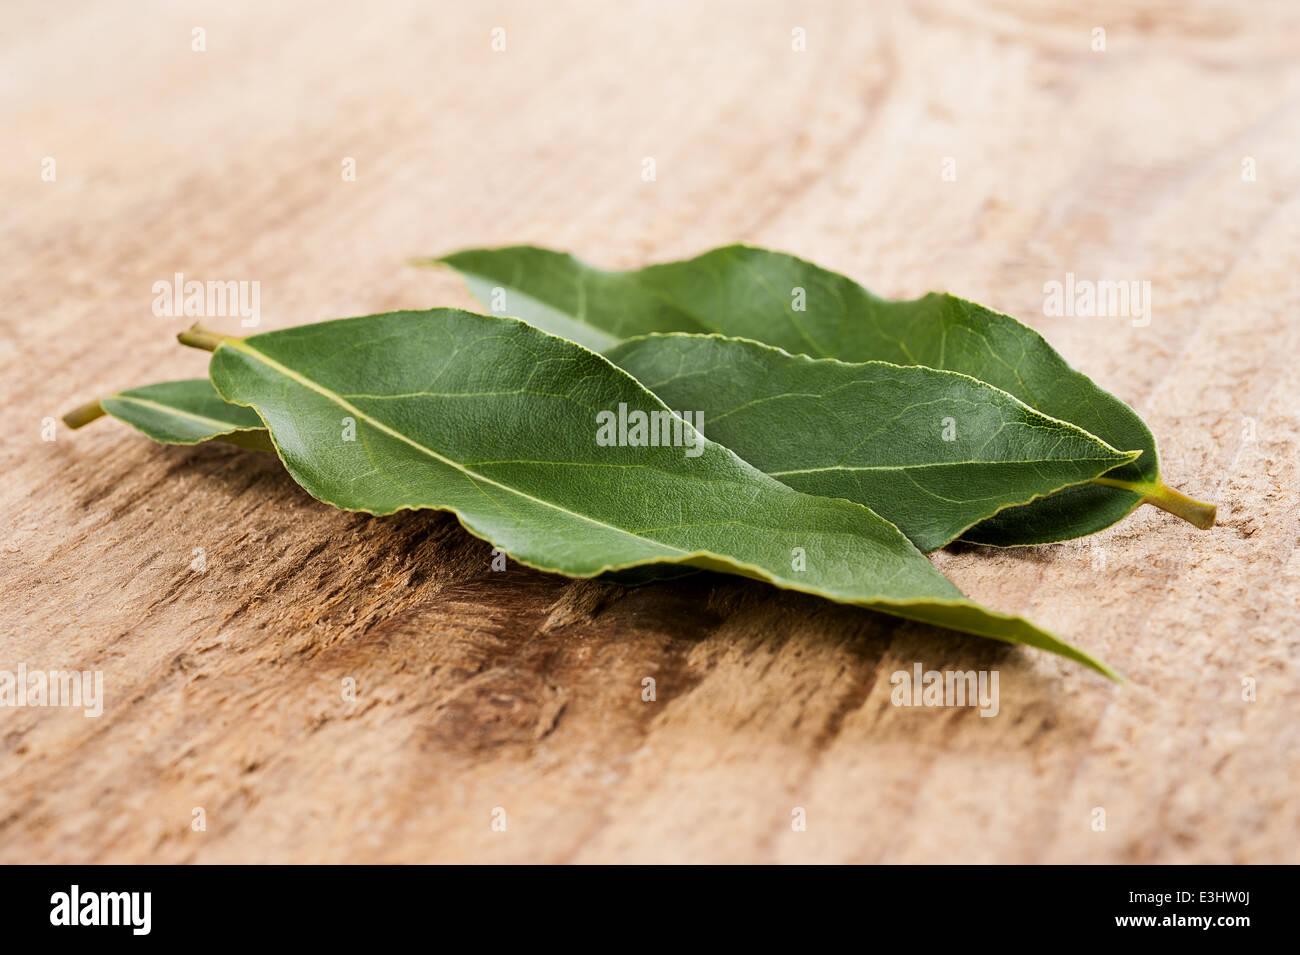 Laurel leaves on wood background - Stock Image